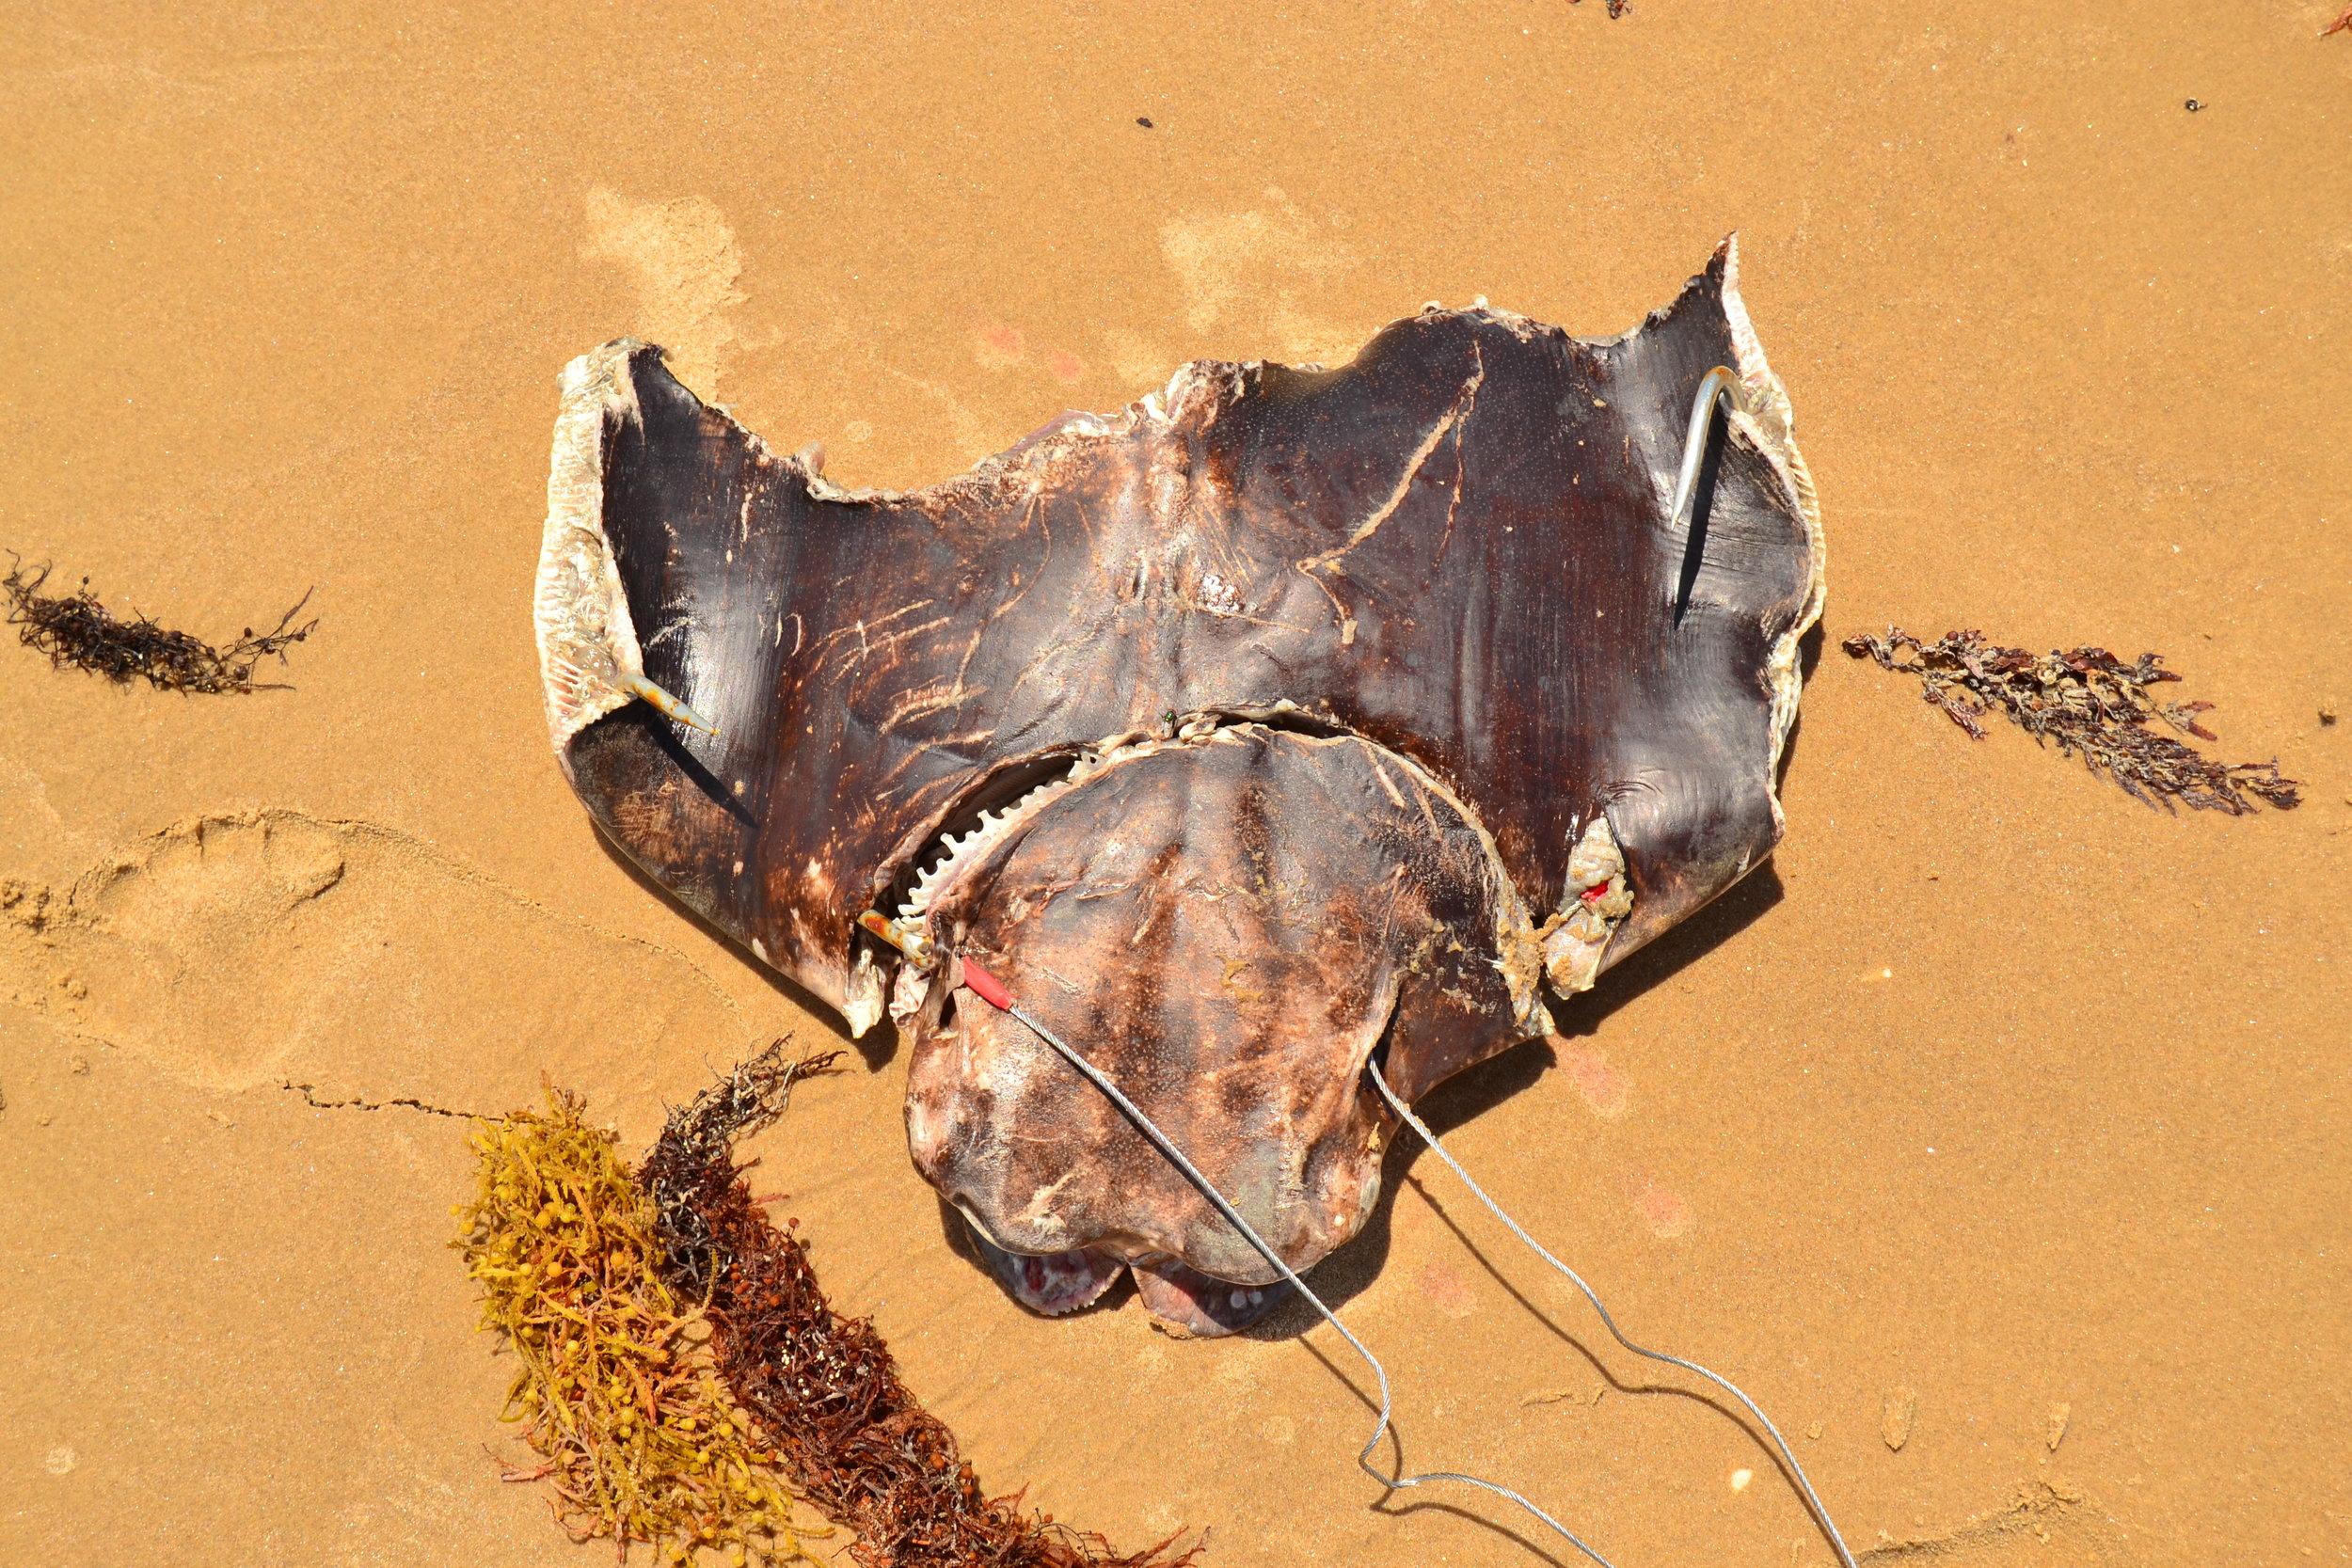 Shark bait BITTEN in half